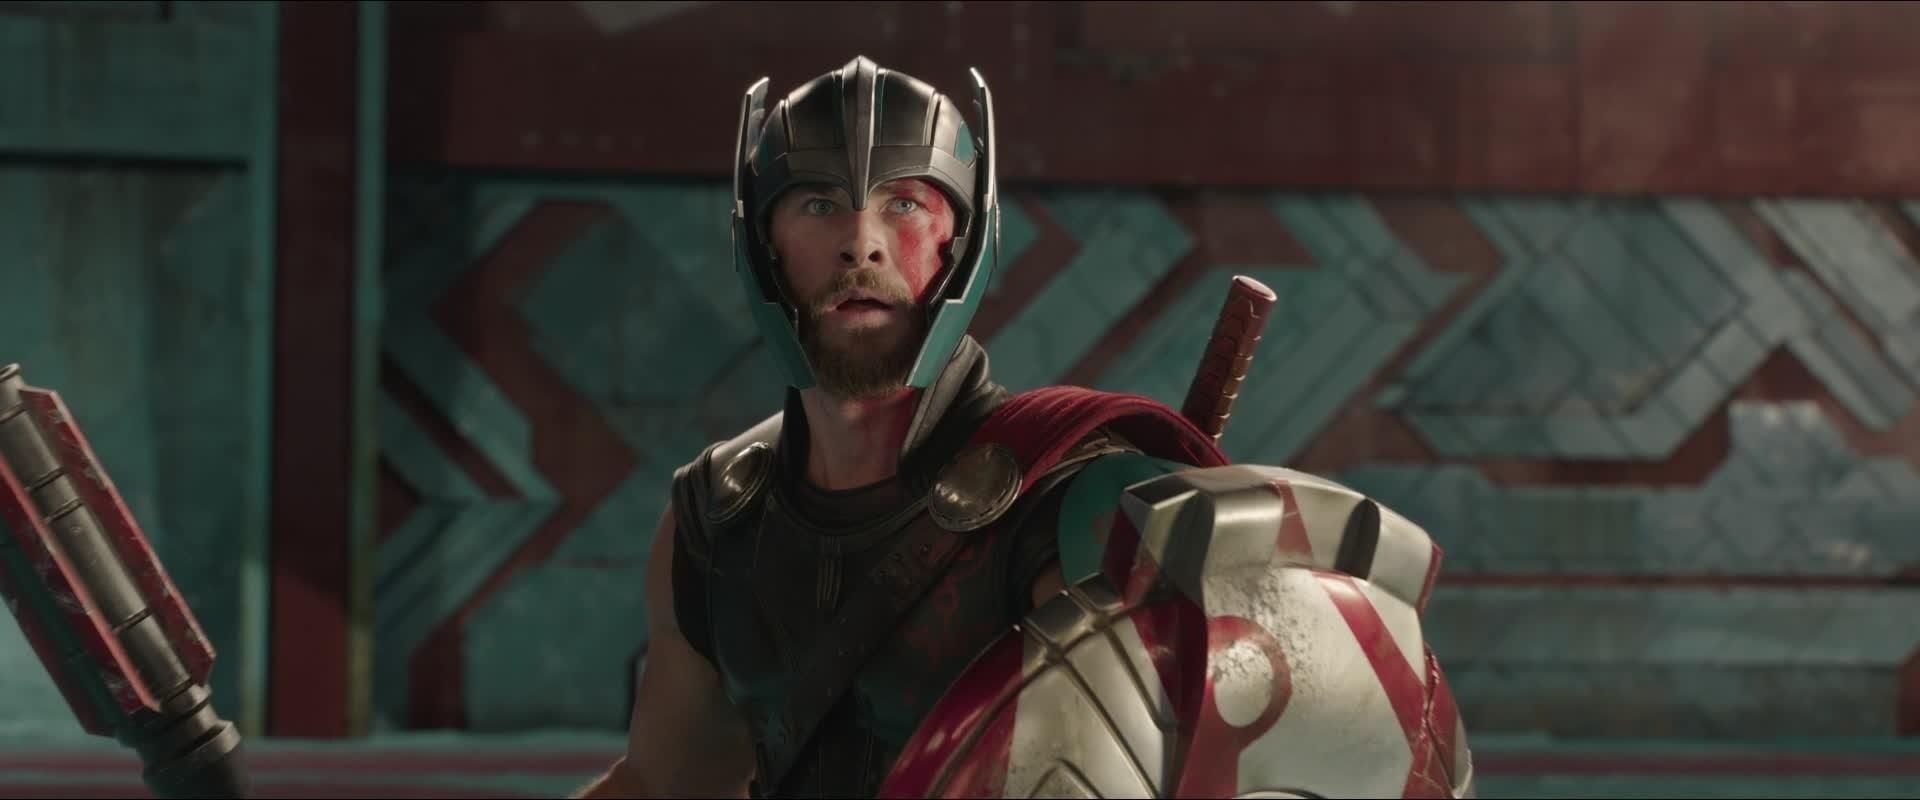 Thor Ragnarok - Bande-Annonce VF